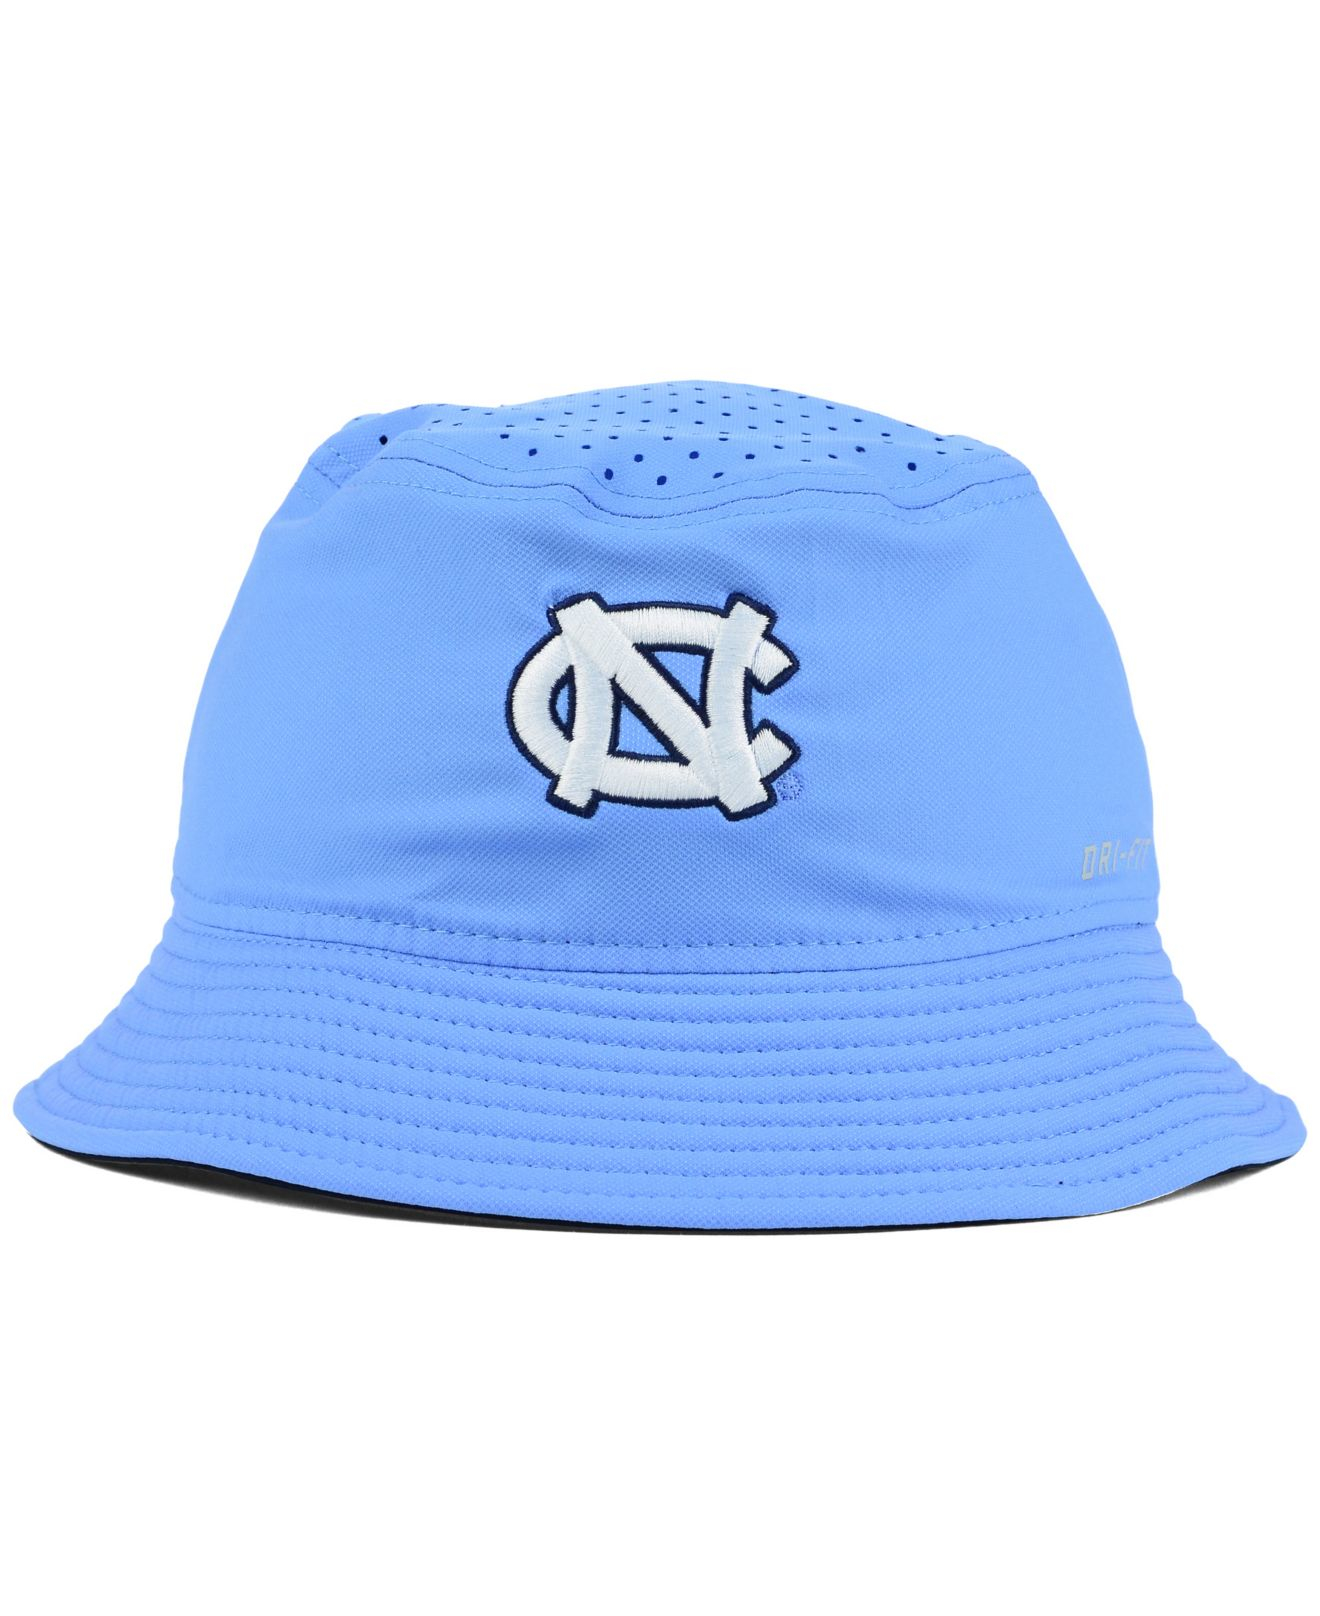 f652c9c4c23 ... usa lyst nike north carolina tar heels vapor bucket hat in blue for men  e24b2 ca61f